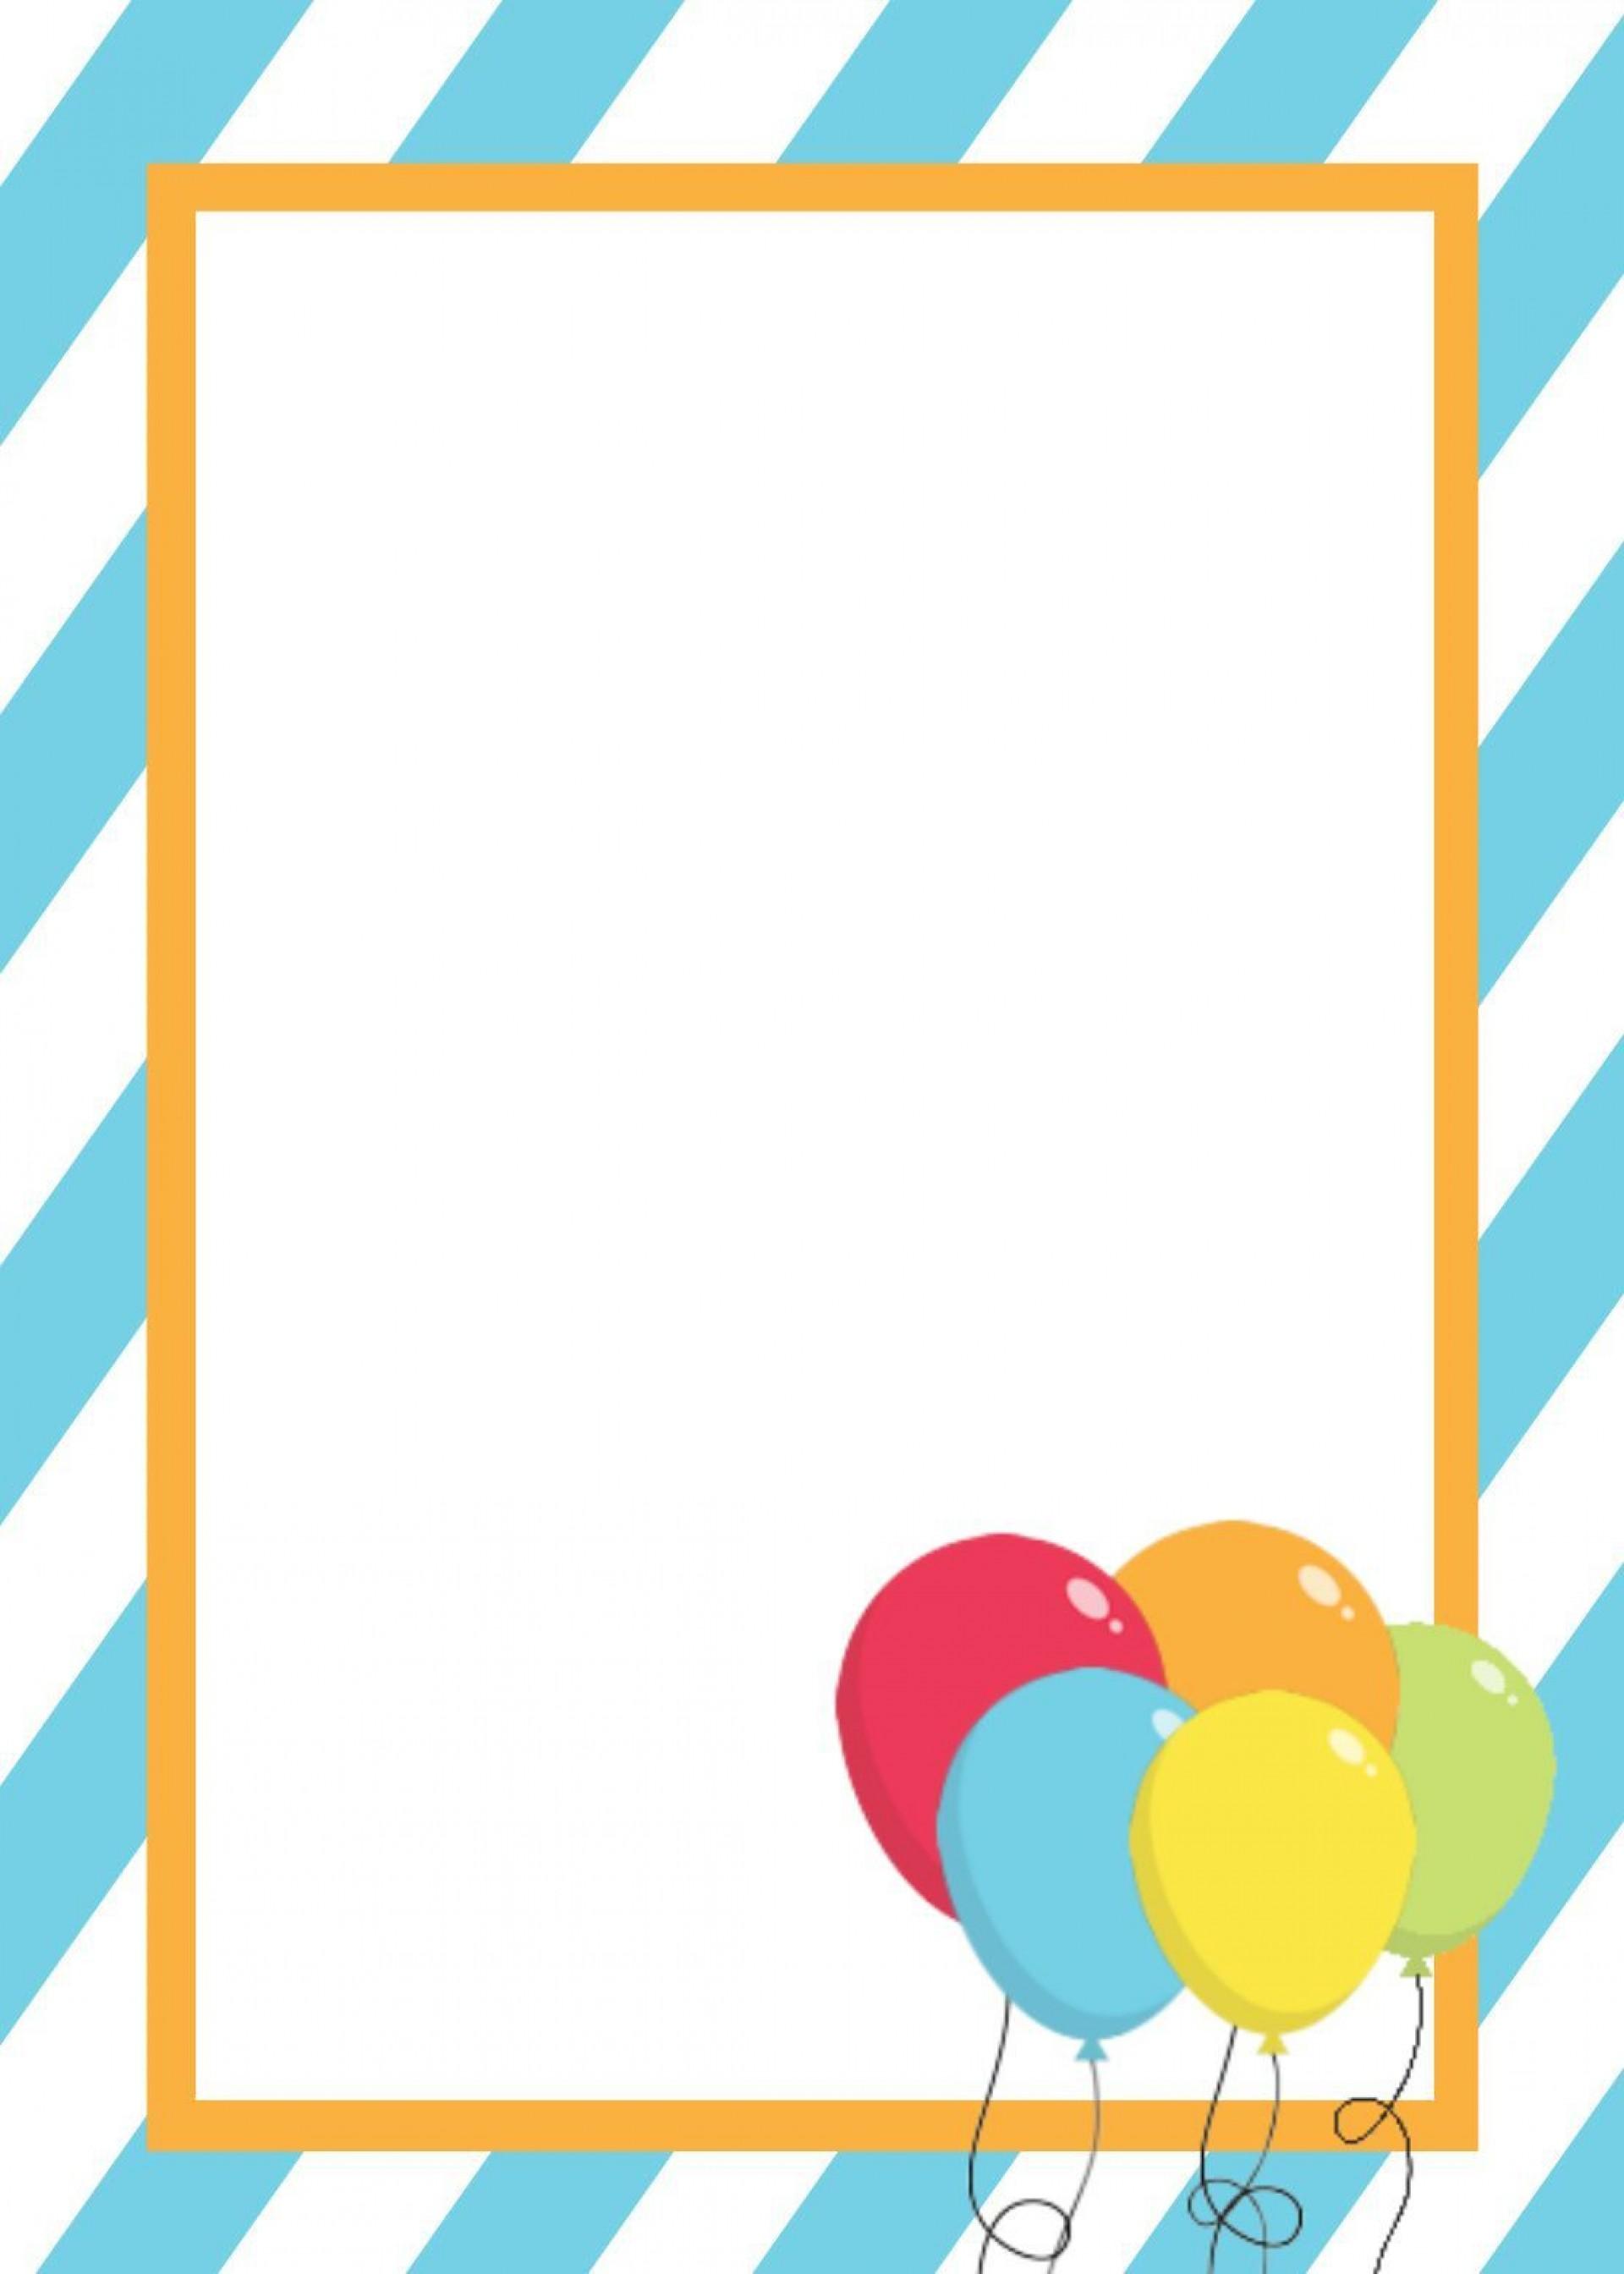 002 Staggering Microsoft Word Birthday Invitation Template Inspiration  Editable 50th 60th1920